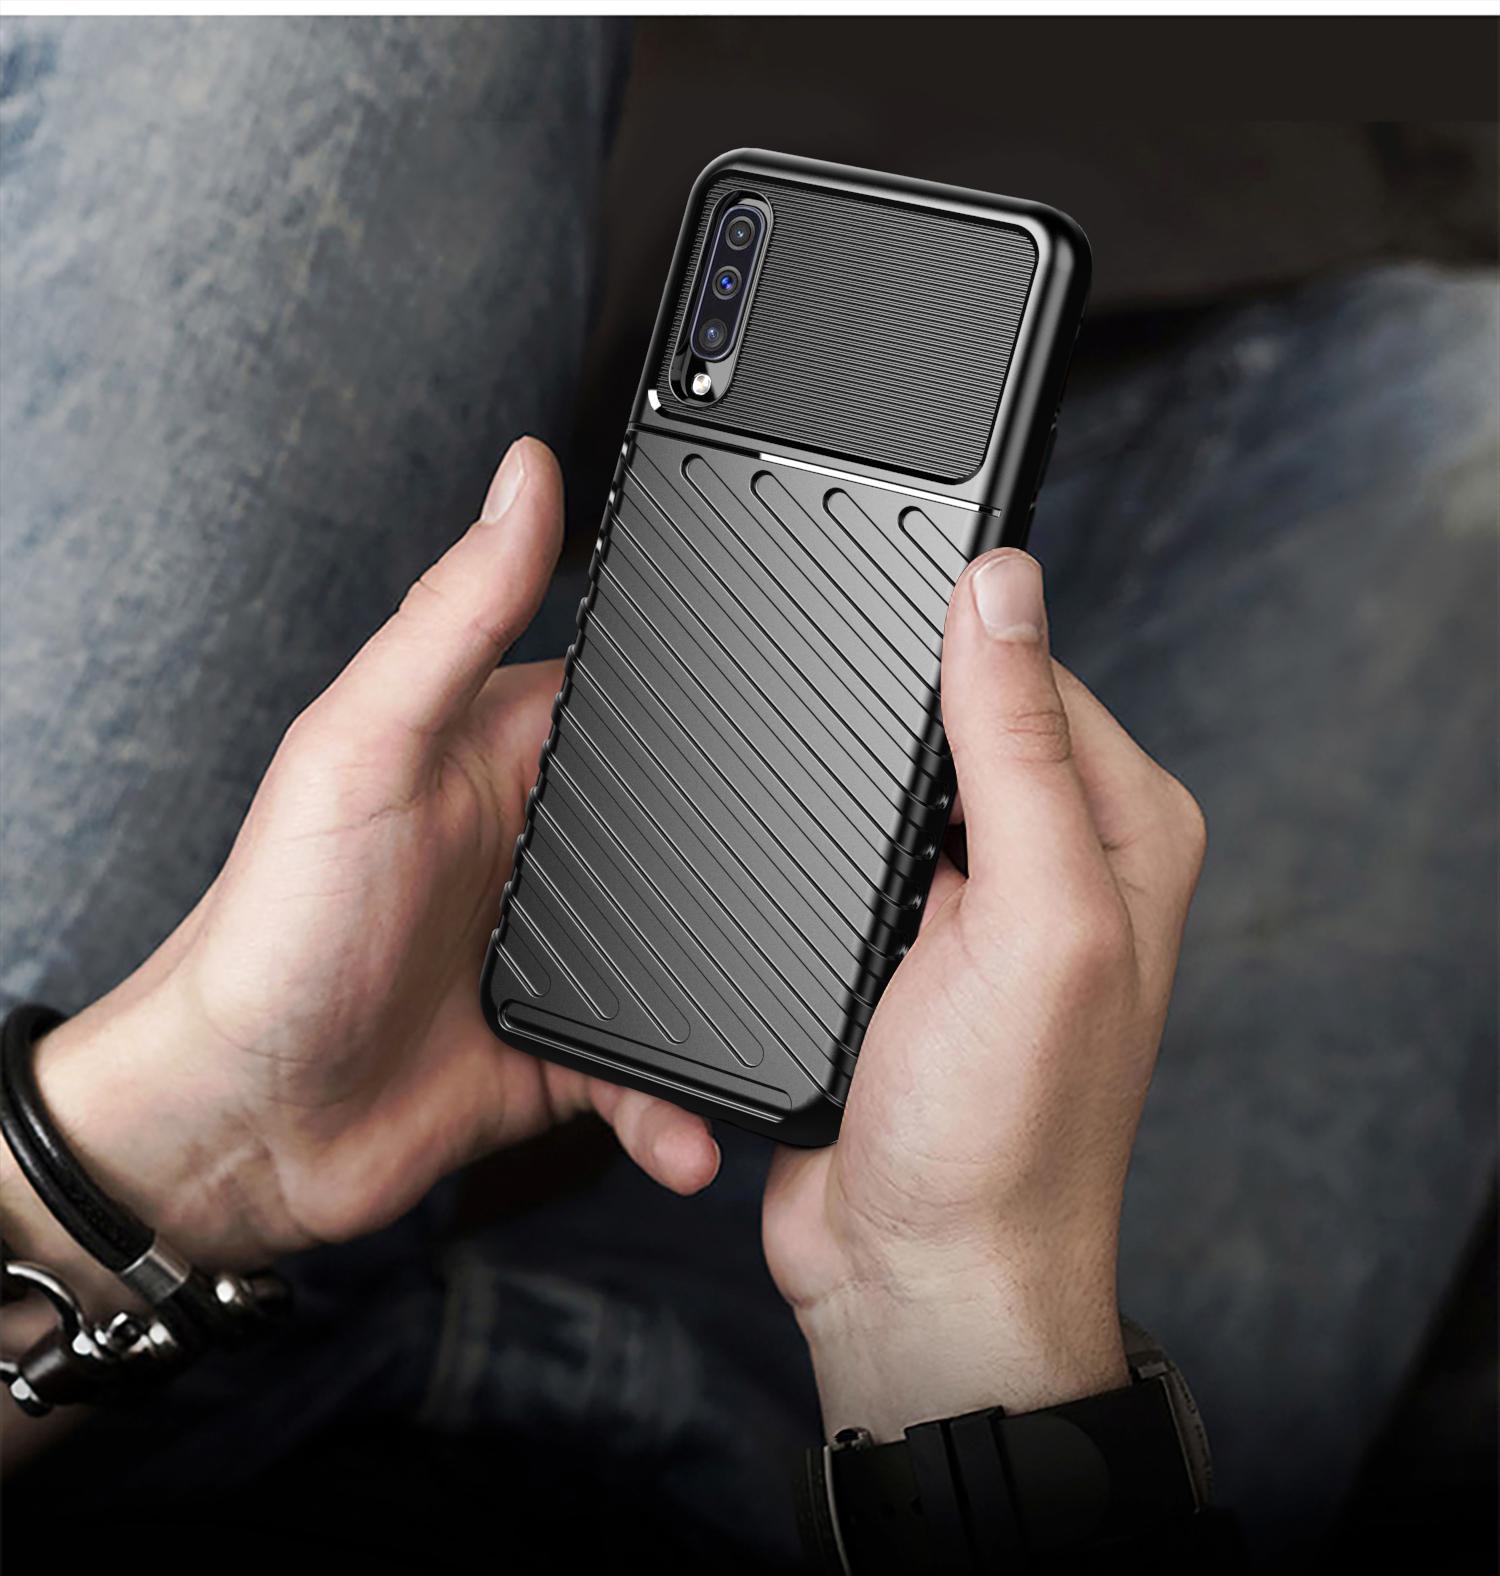 Чехол Samsung Galaxy A50 (Galaxy A30S, A50S) цвет Black (черный), серия Onyx, Caseport